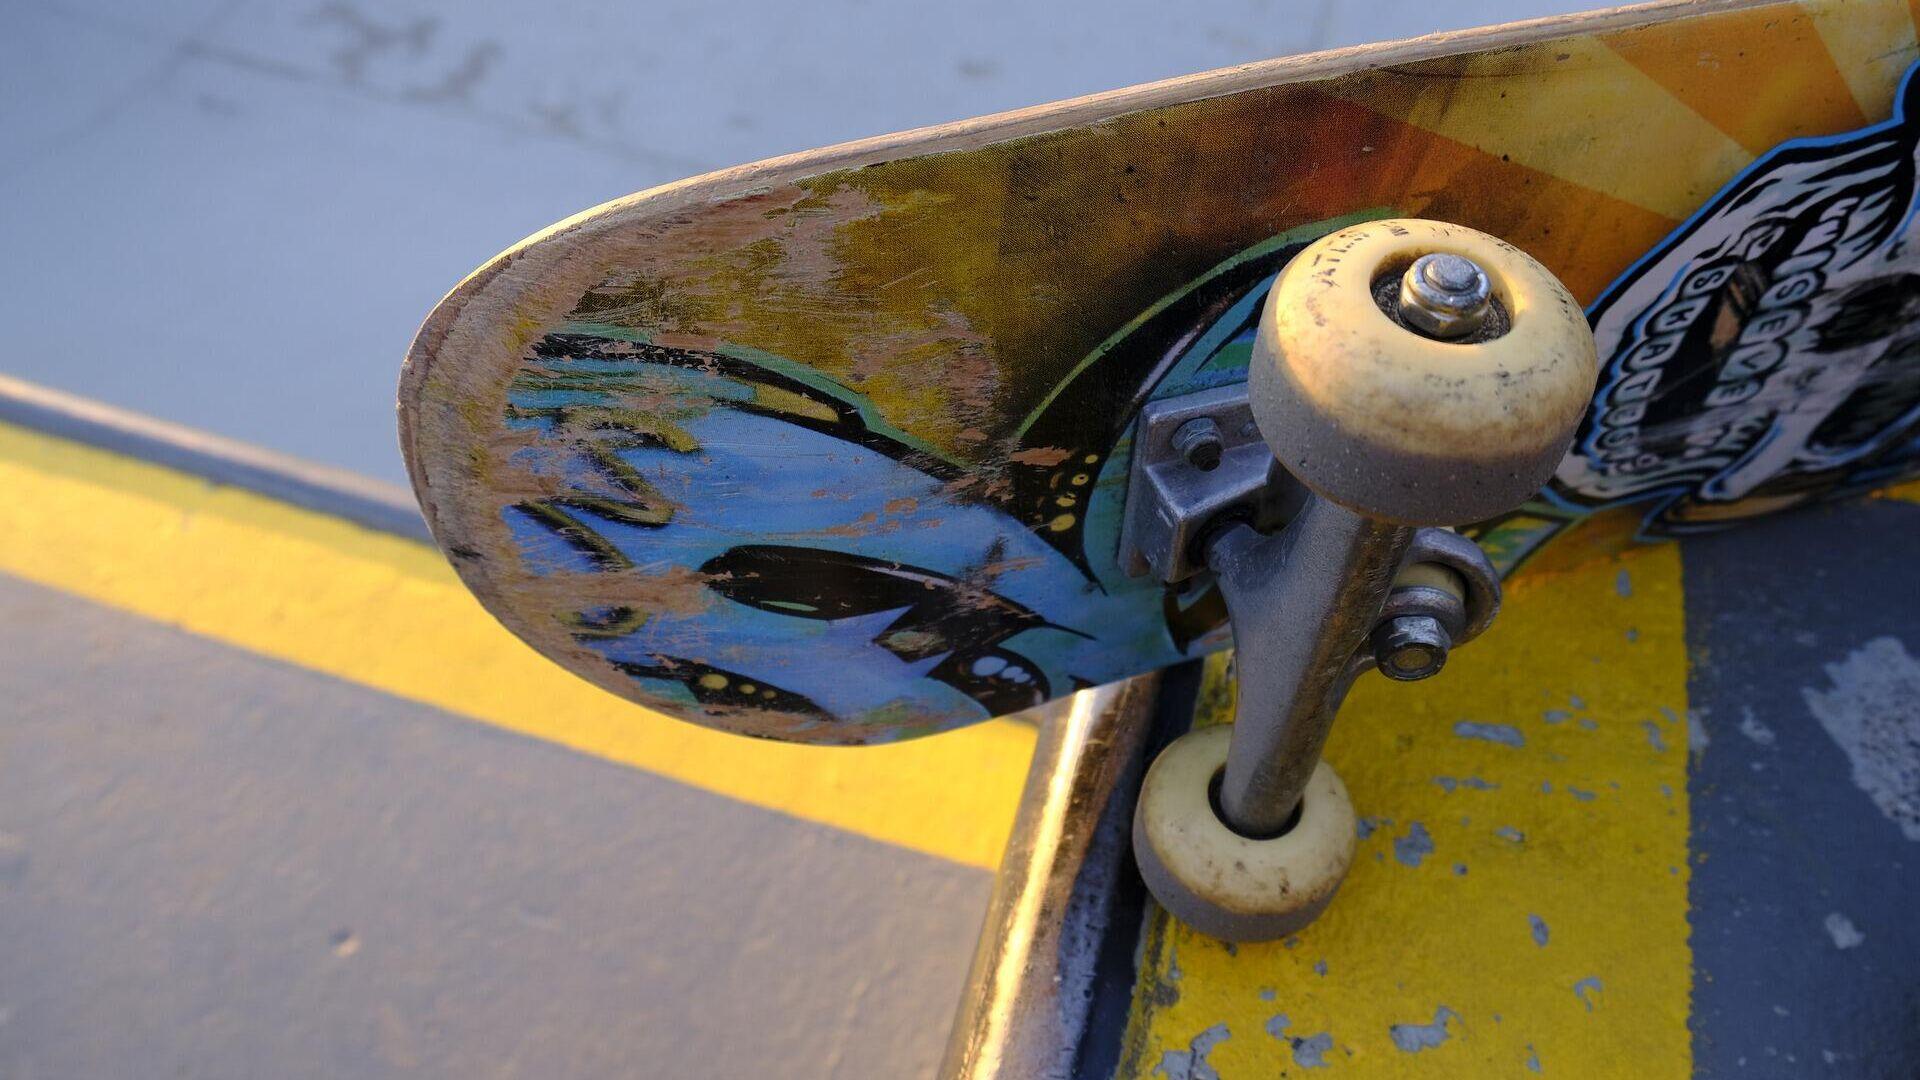 Skateboard  - SNA, 1920, 02.07.2021